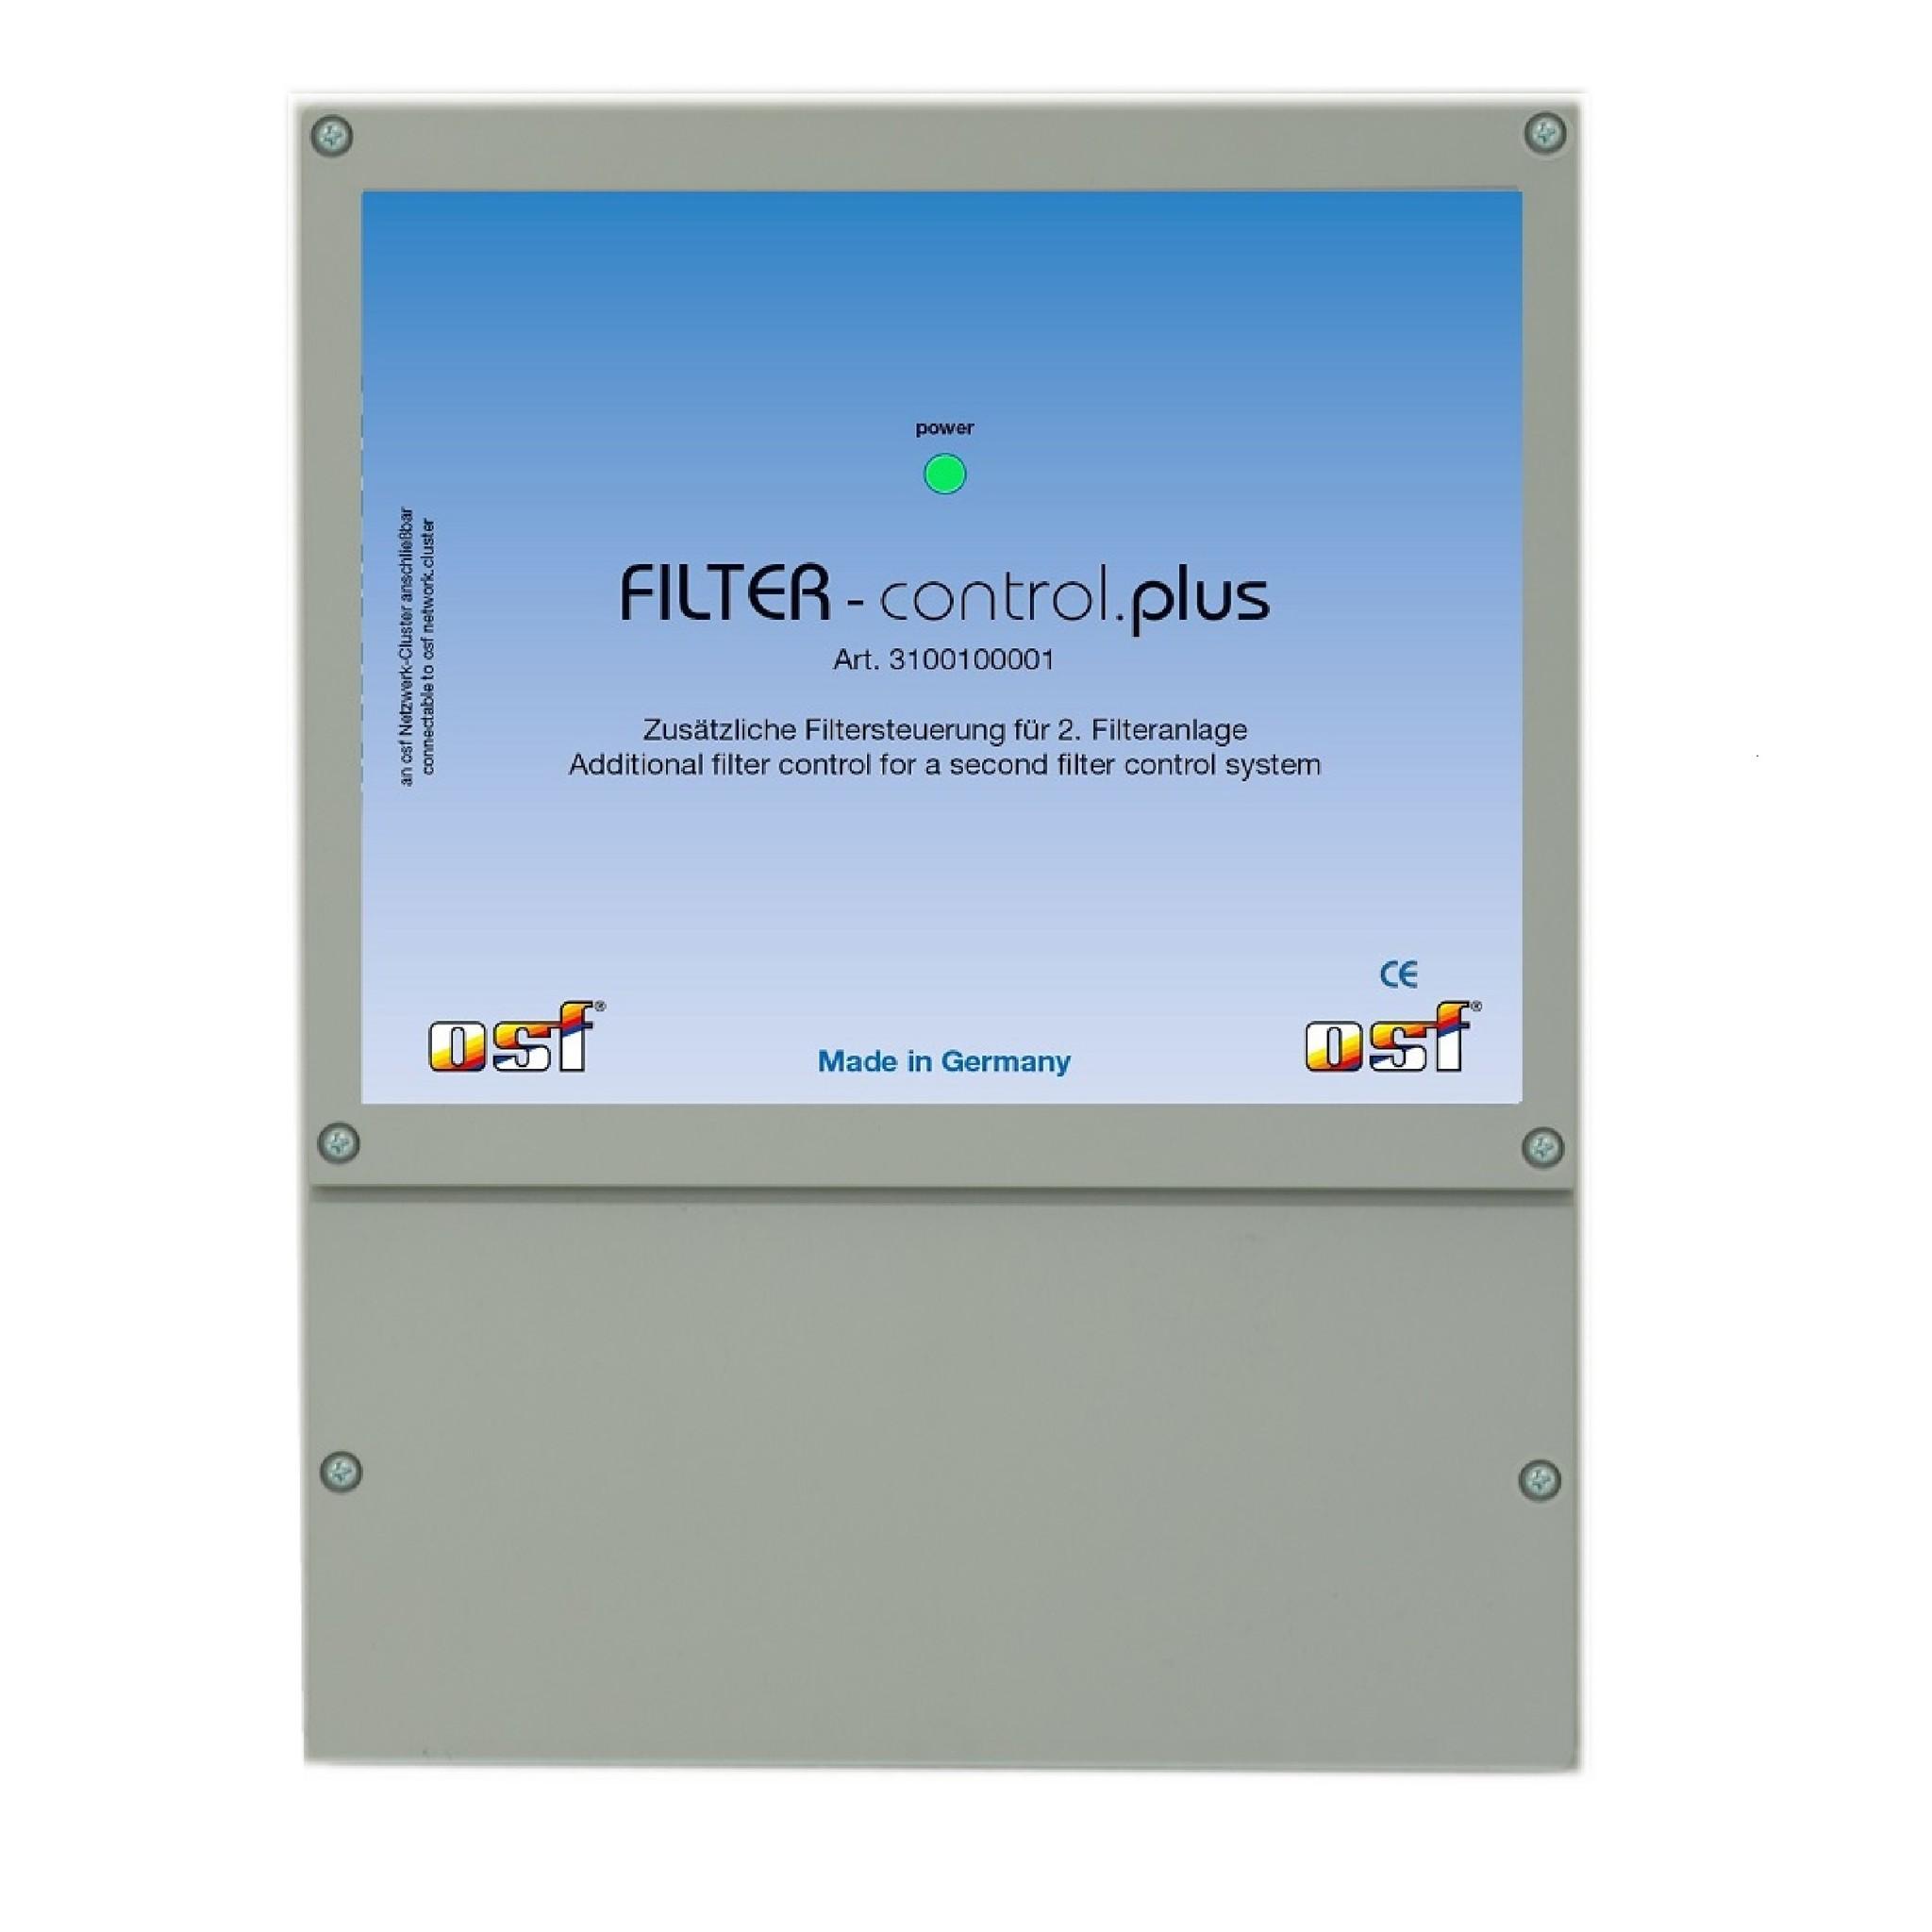 OSF Filter-Control.plus